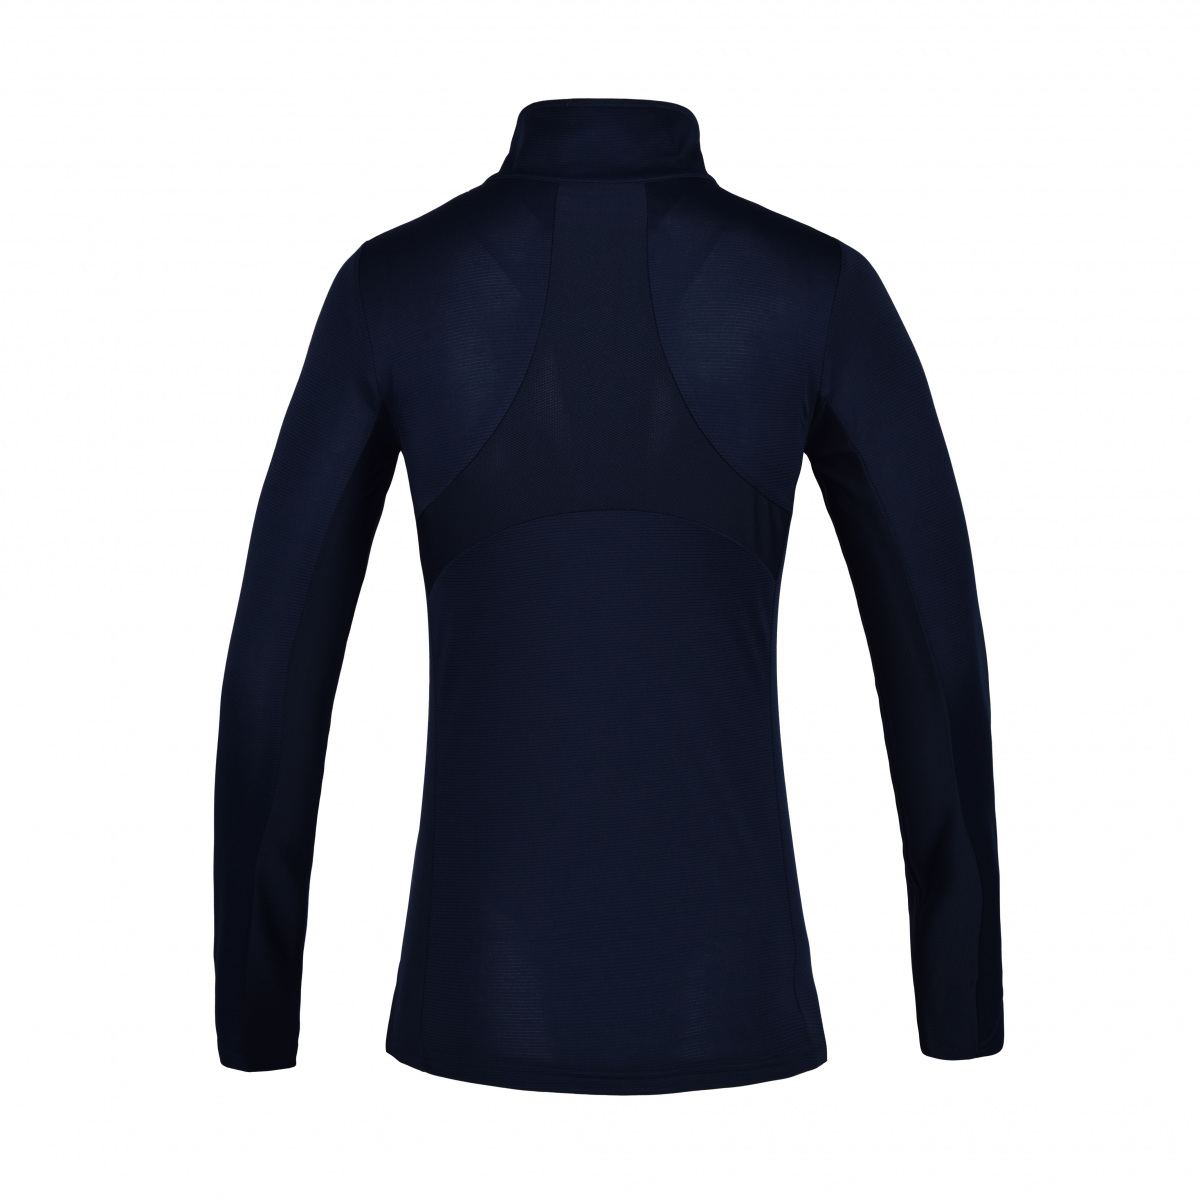 【KL】ALETA レディース トレーニングシャツ長袖